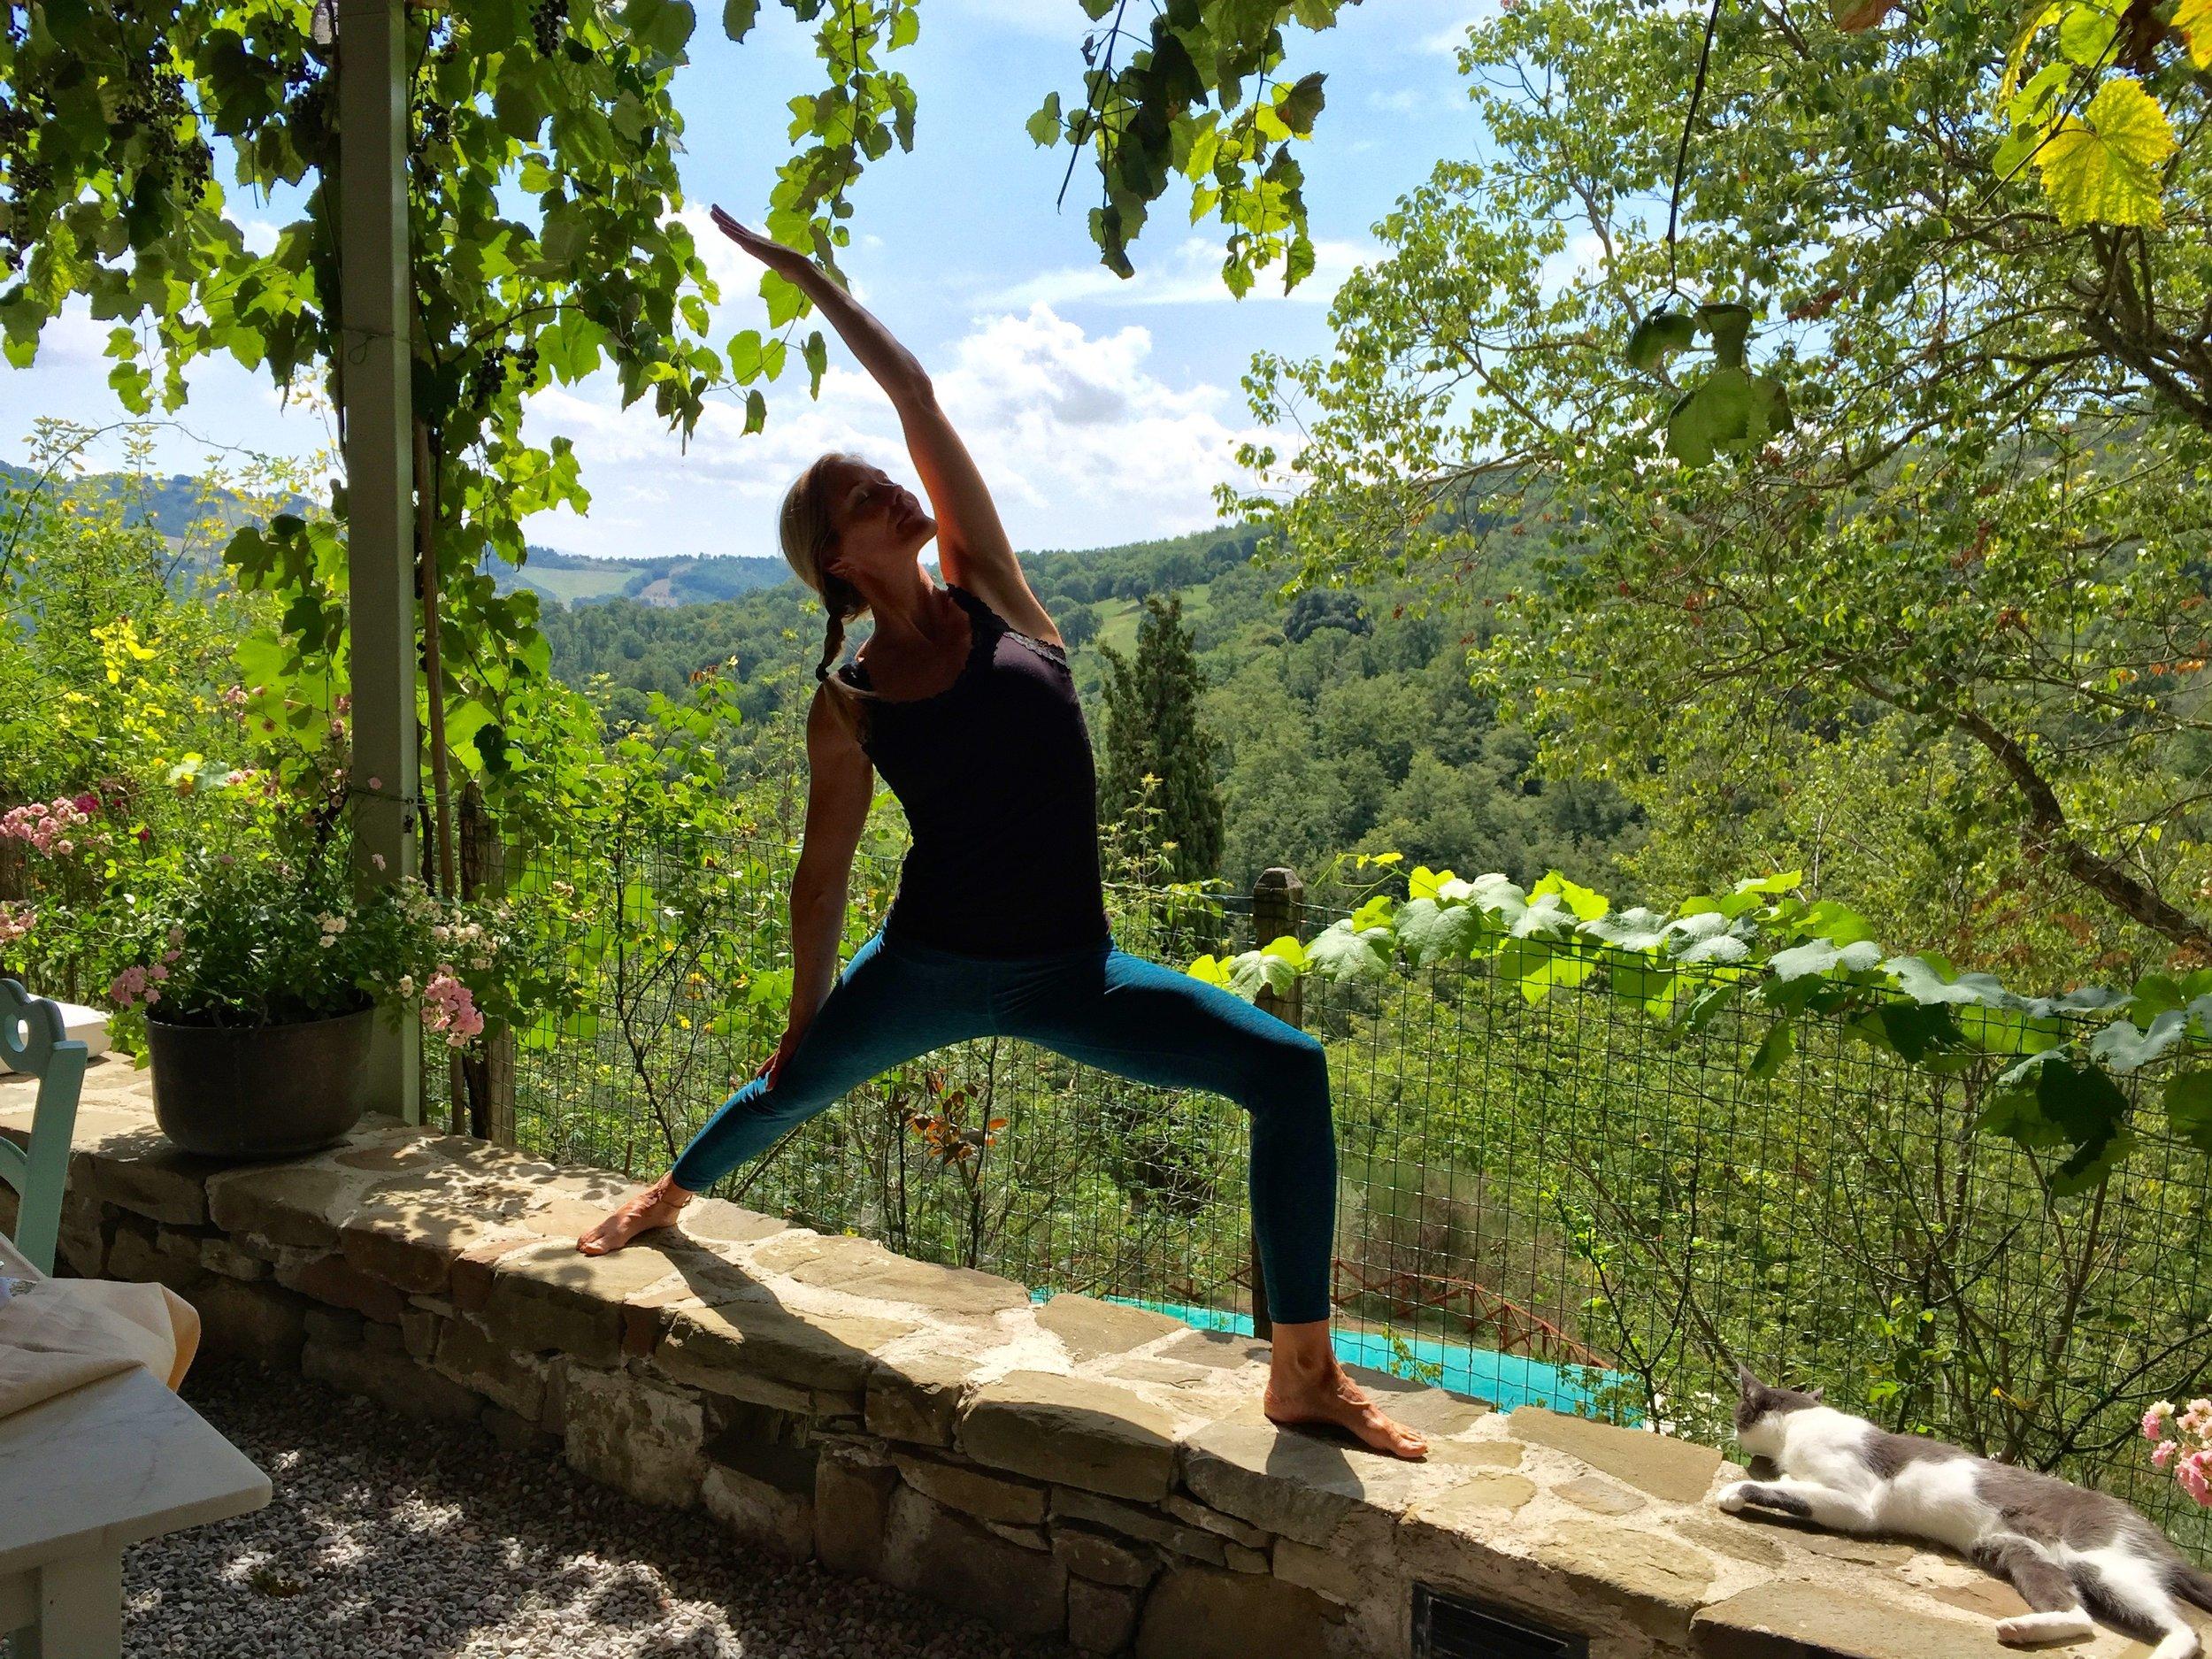 Yoga retreat in Italian countryside with Gayle Olson